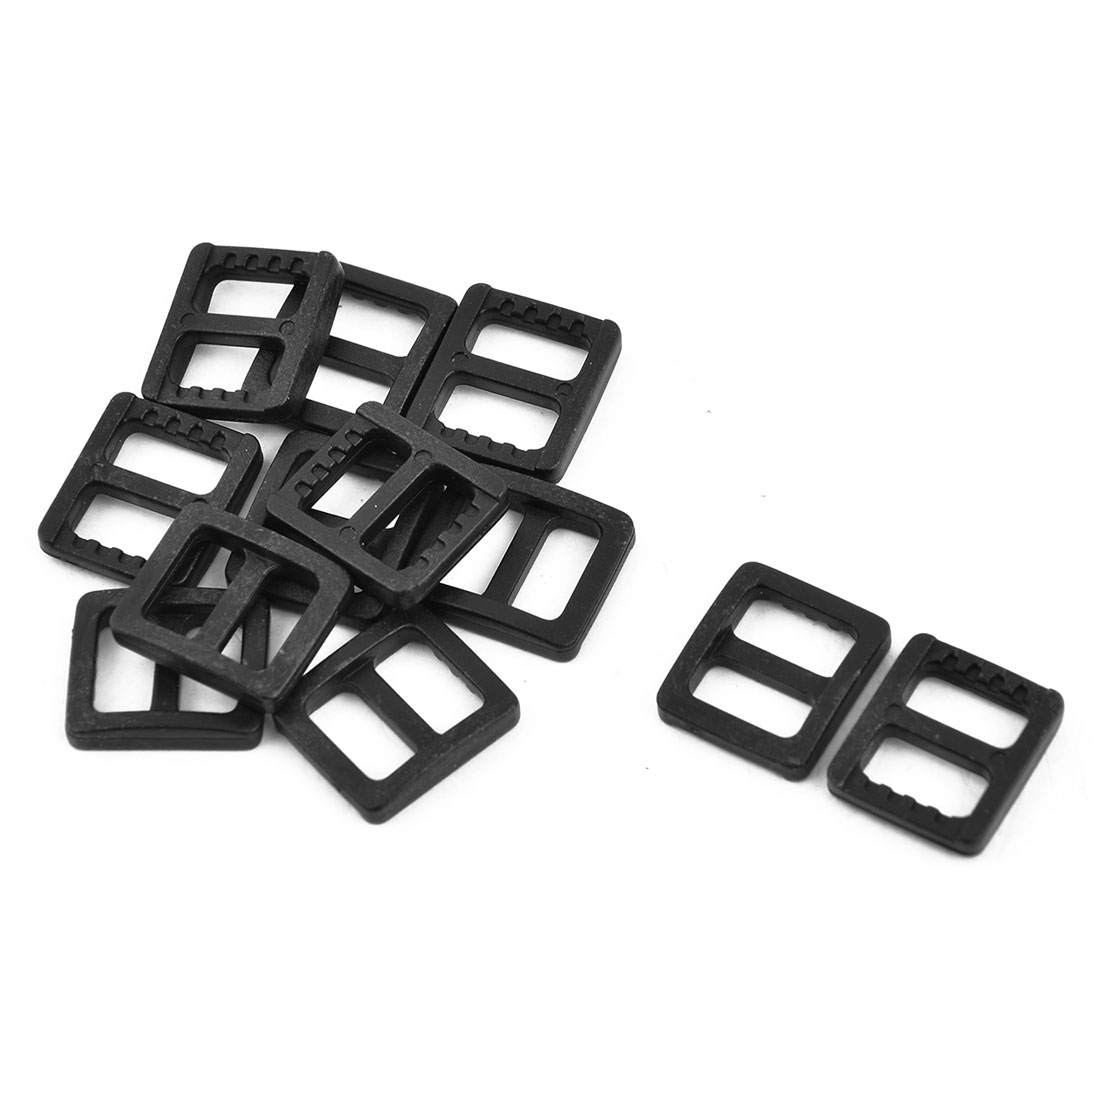 Schoolbag Webbing Plastic Adjustable Ladder Lock Fastener Buckle 10mm Strap Width 12pcs